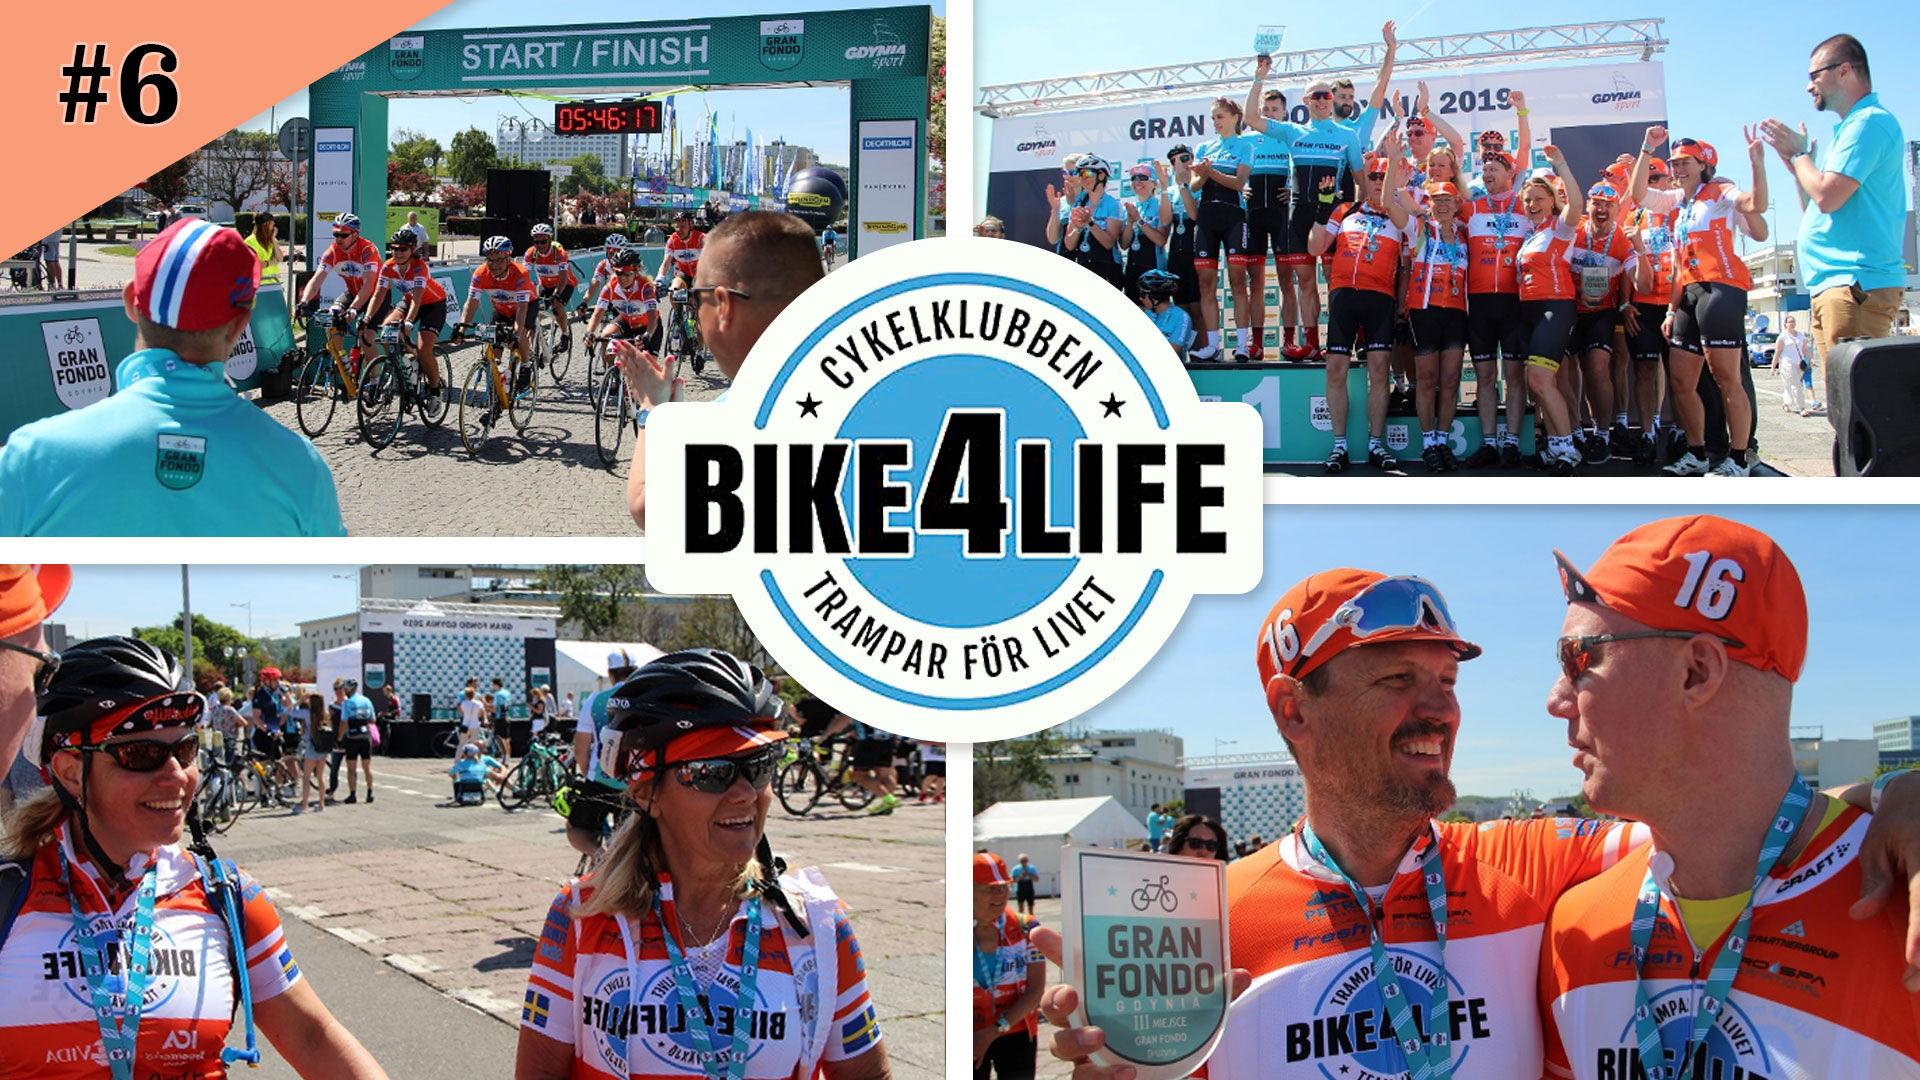 Bike4Life etapp 6